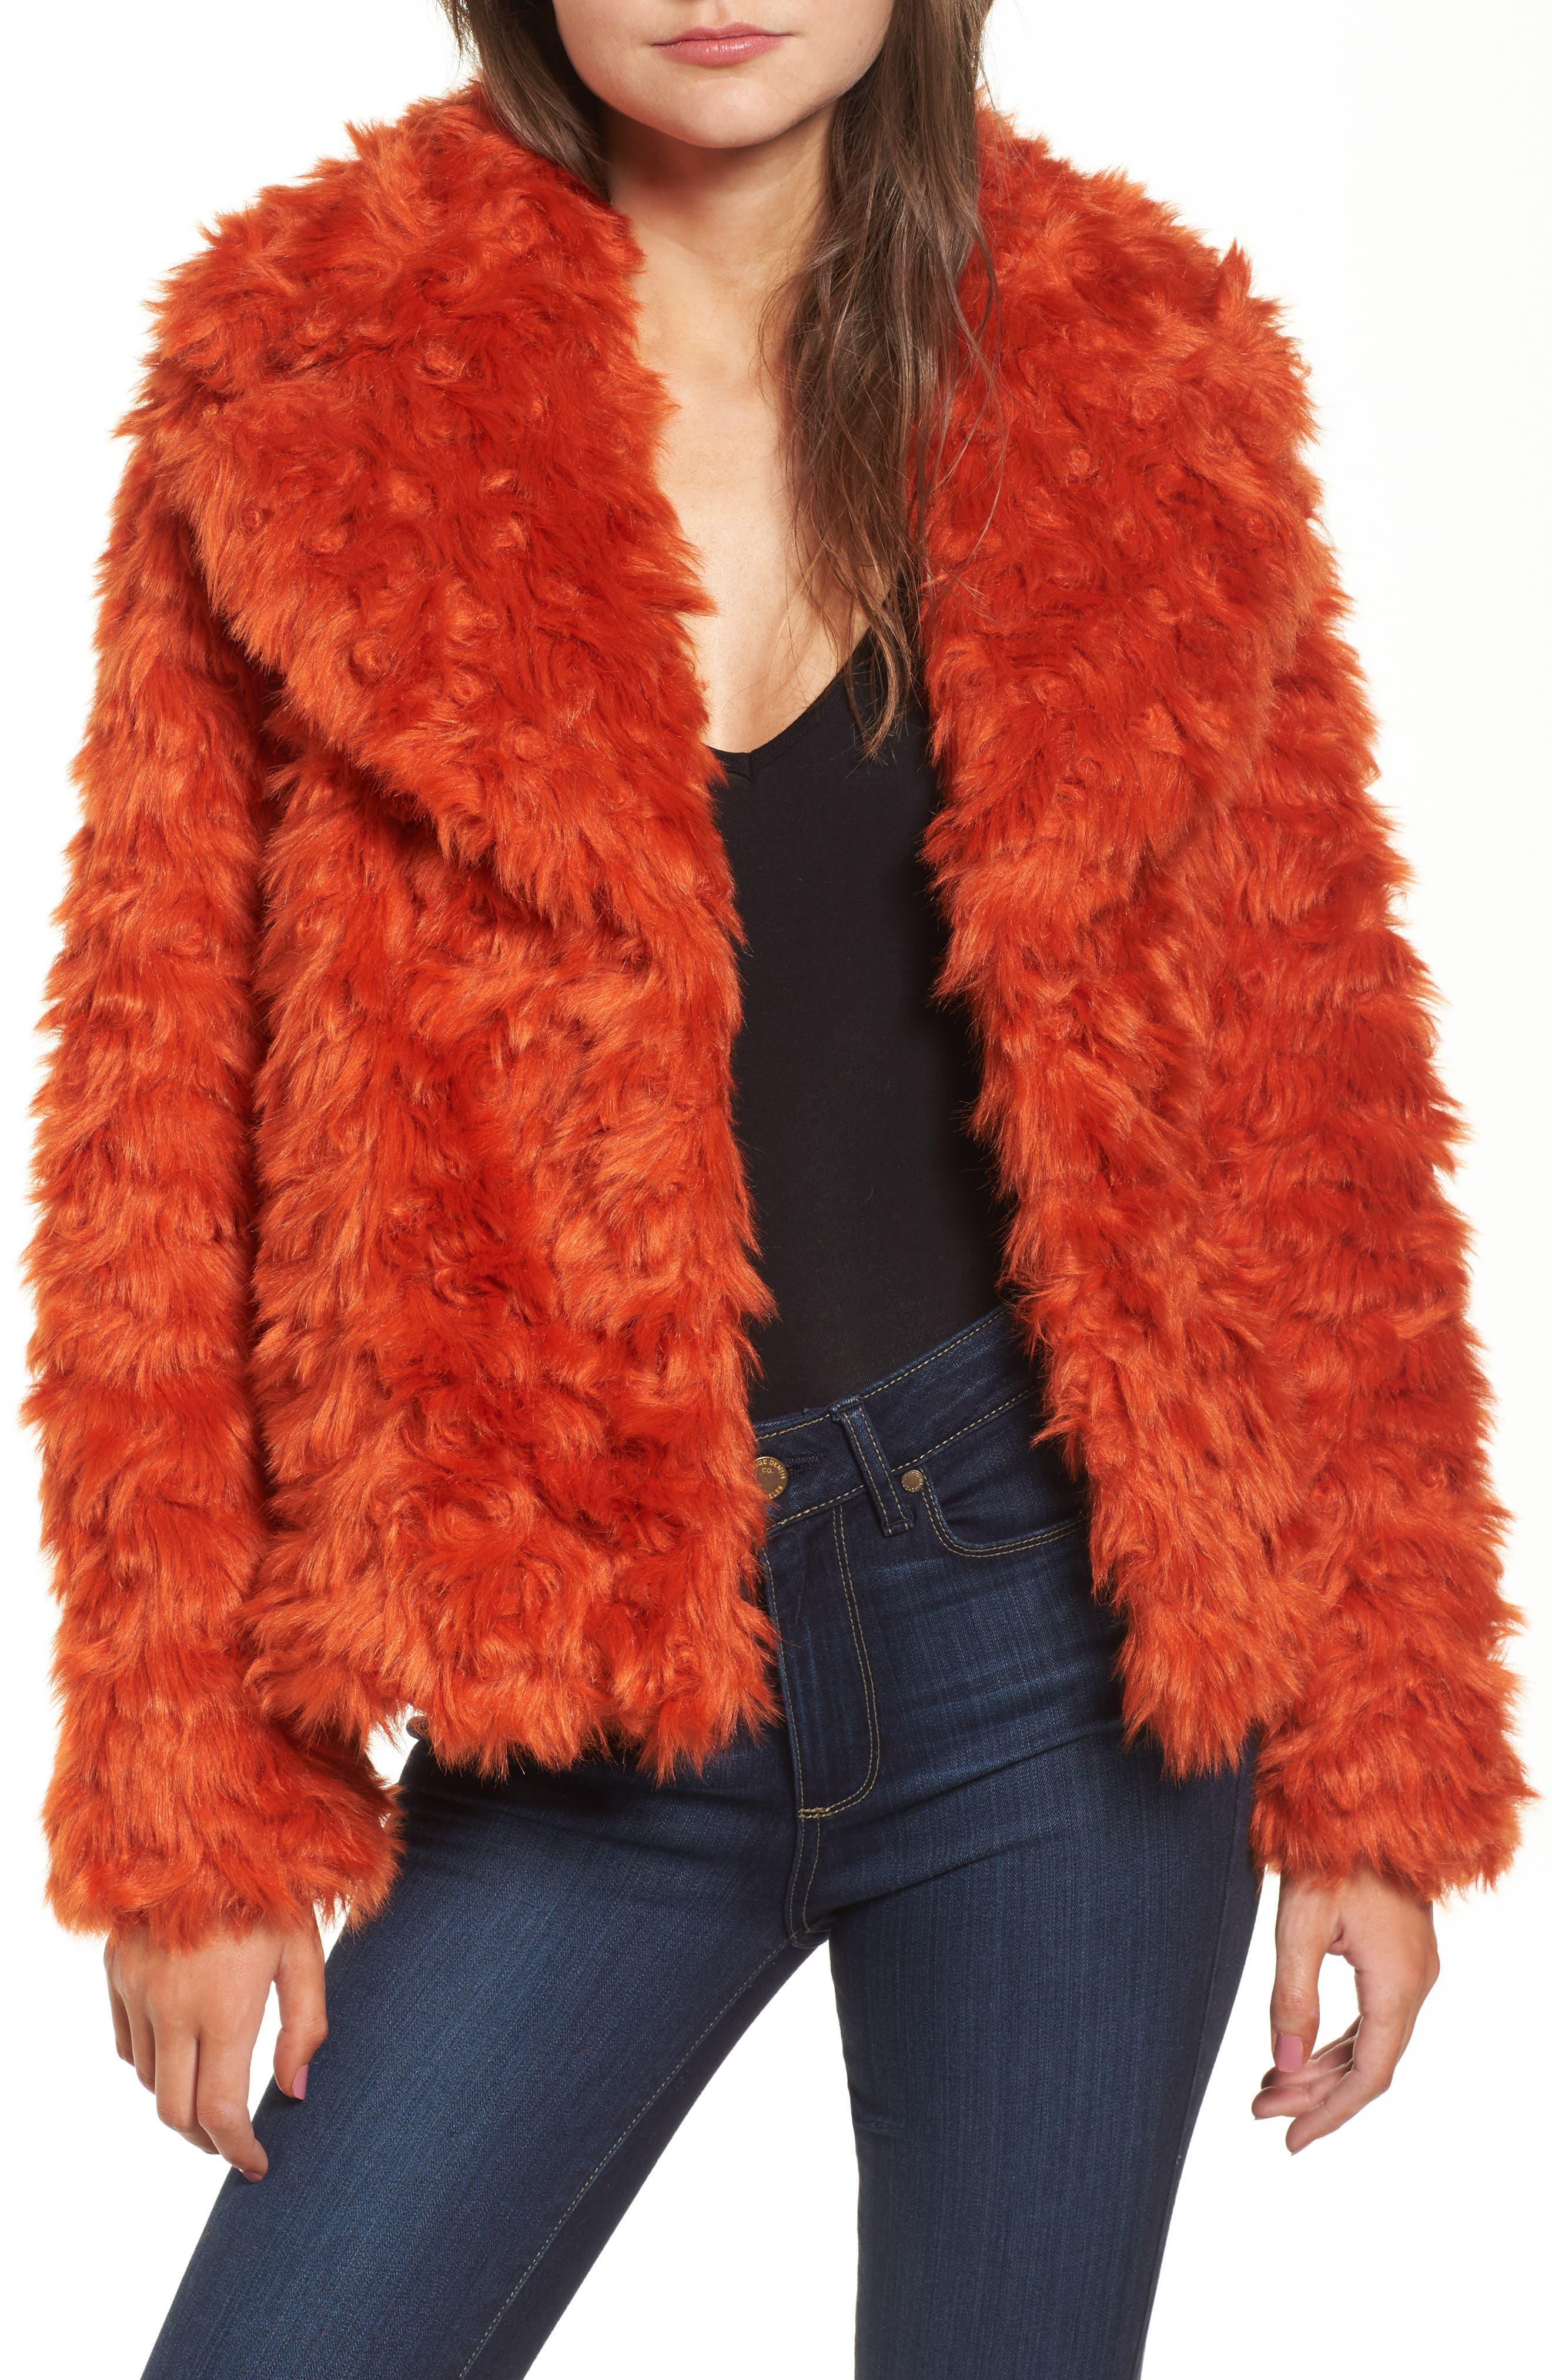 Curly Faux Fur Jacket,                         Main,                         color, 800